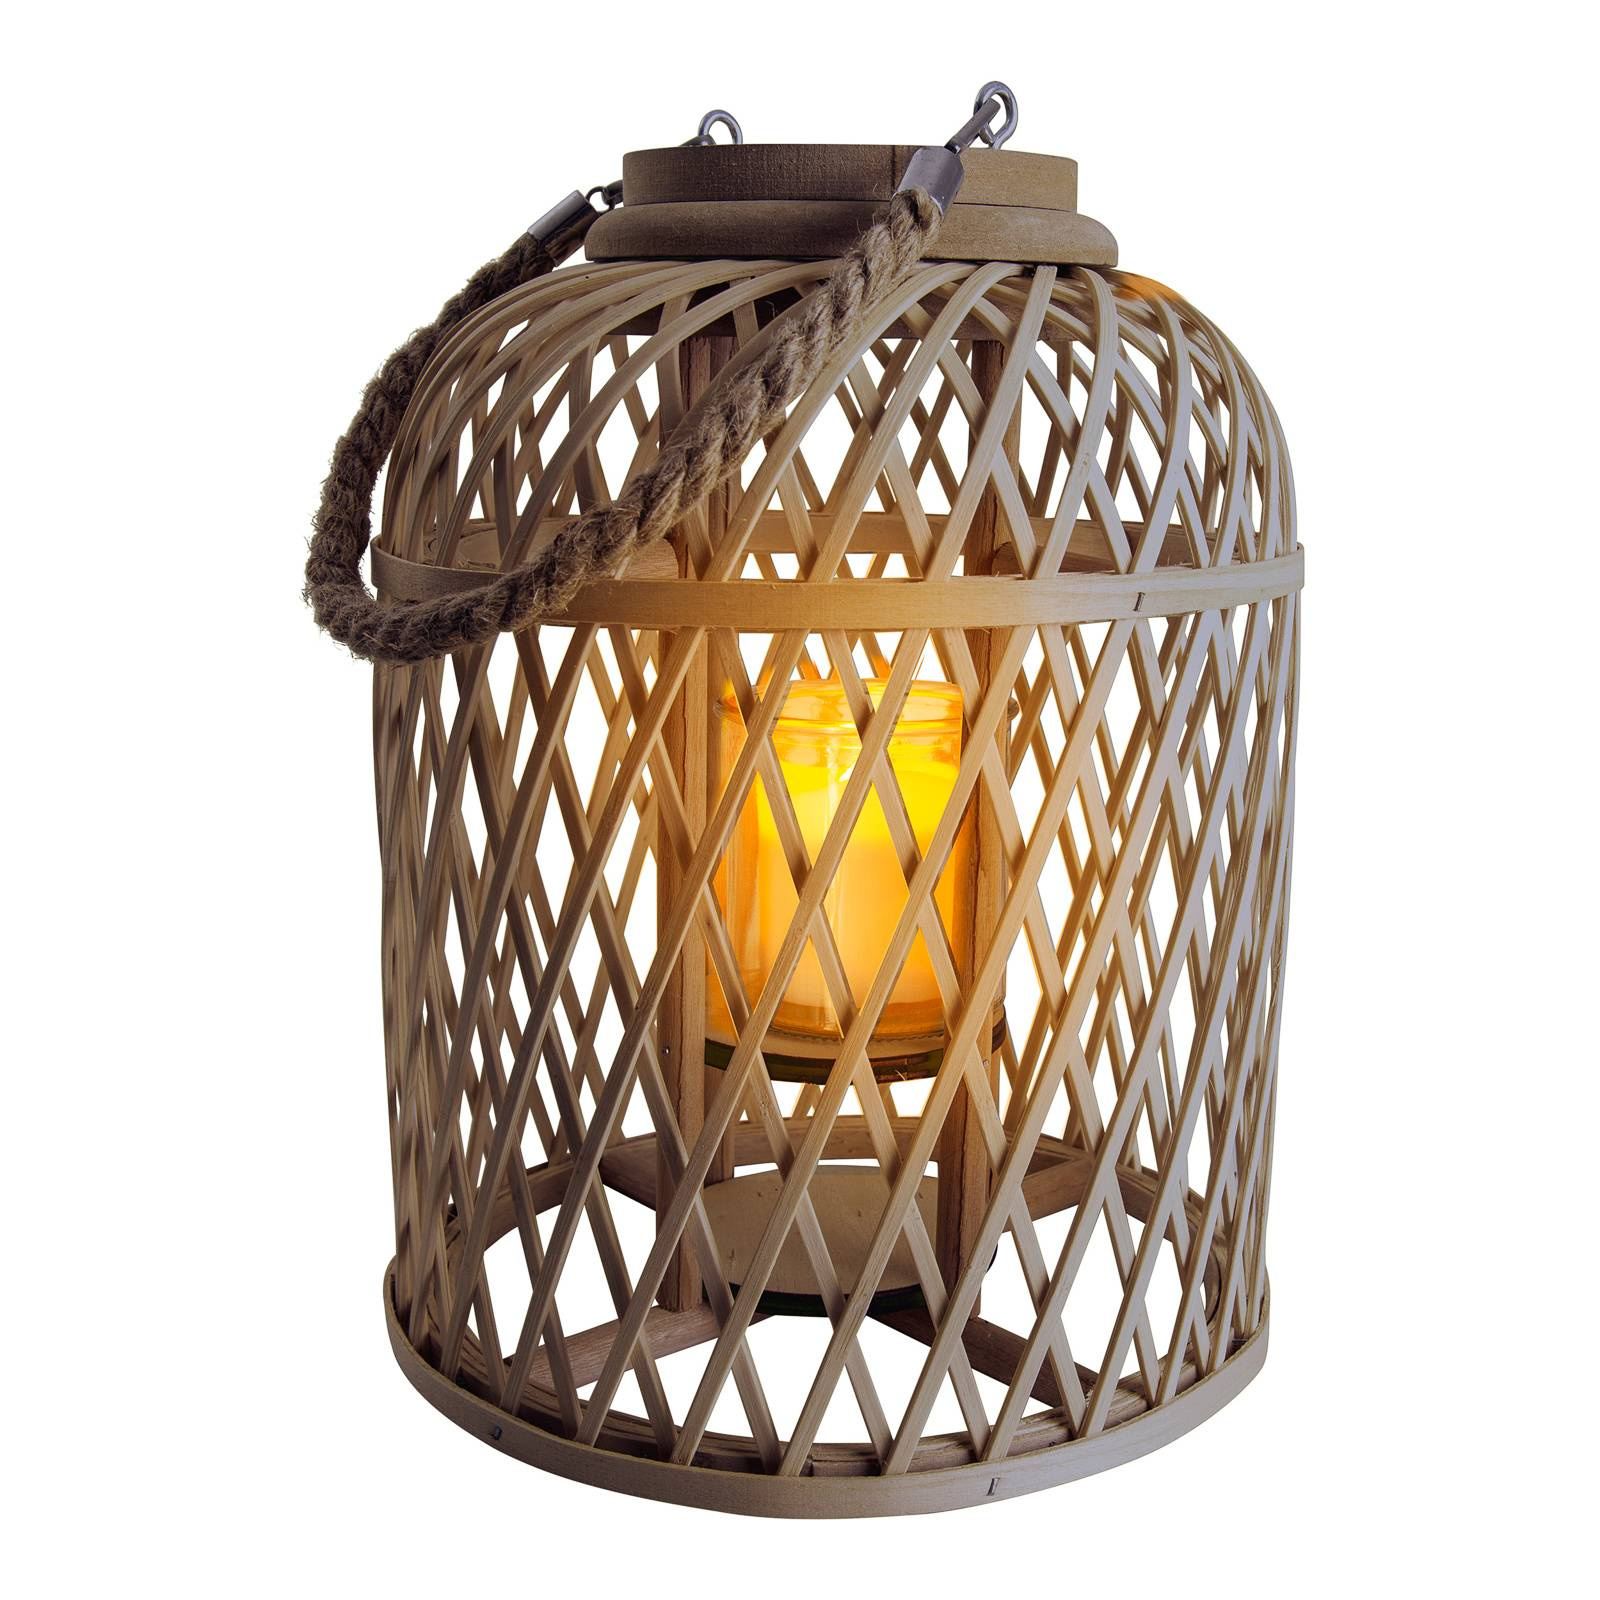 Aurinkokäyttöinen LED-lyhty Korb, 29 cm, ruskea